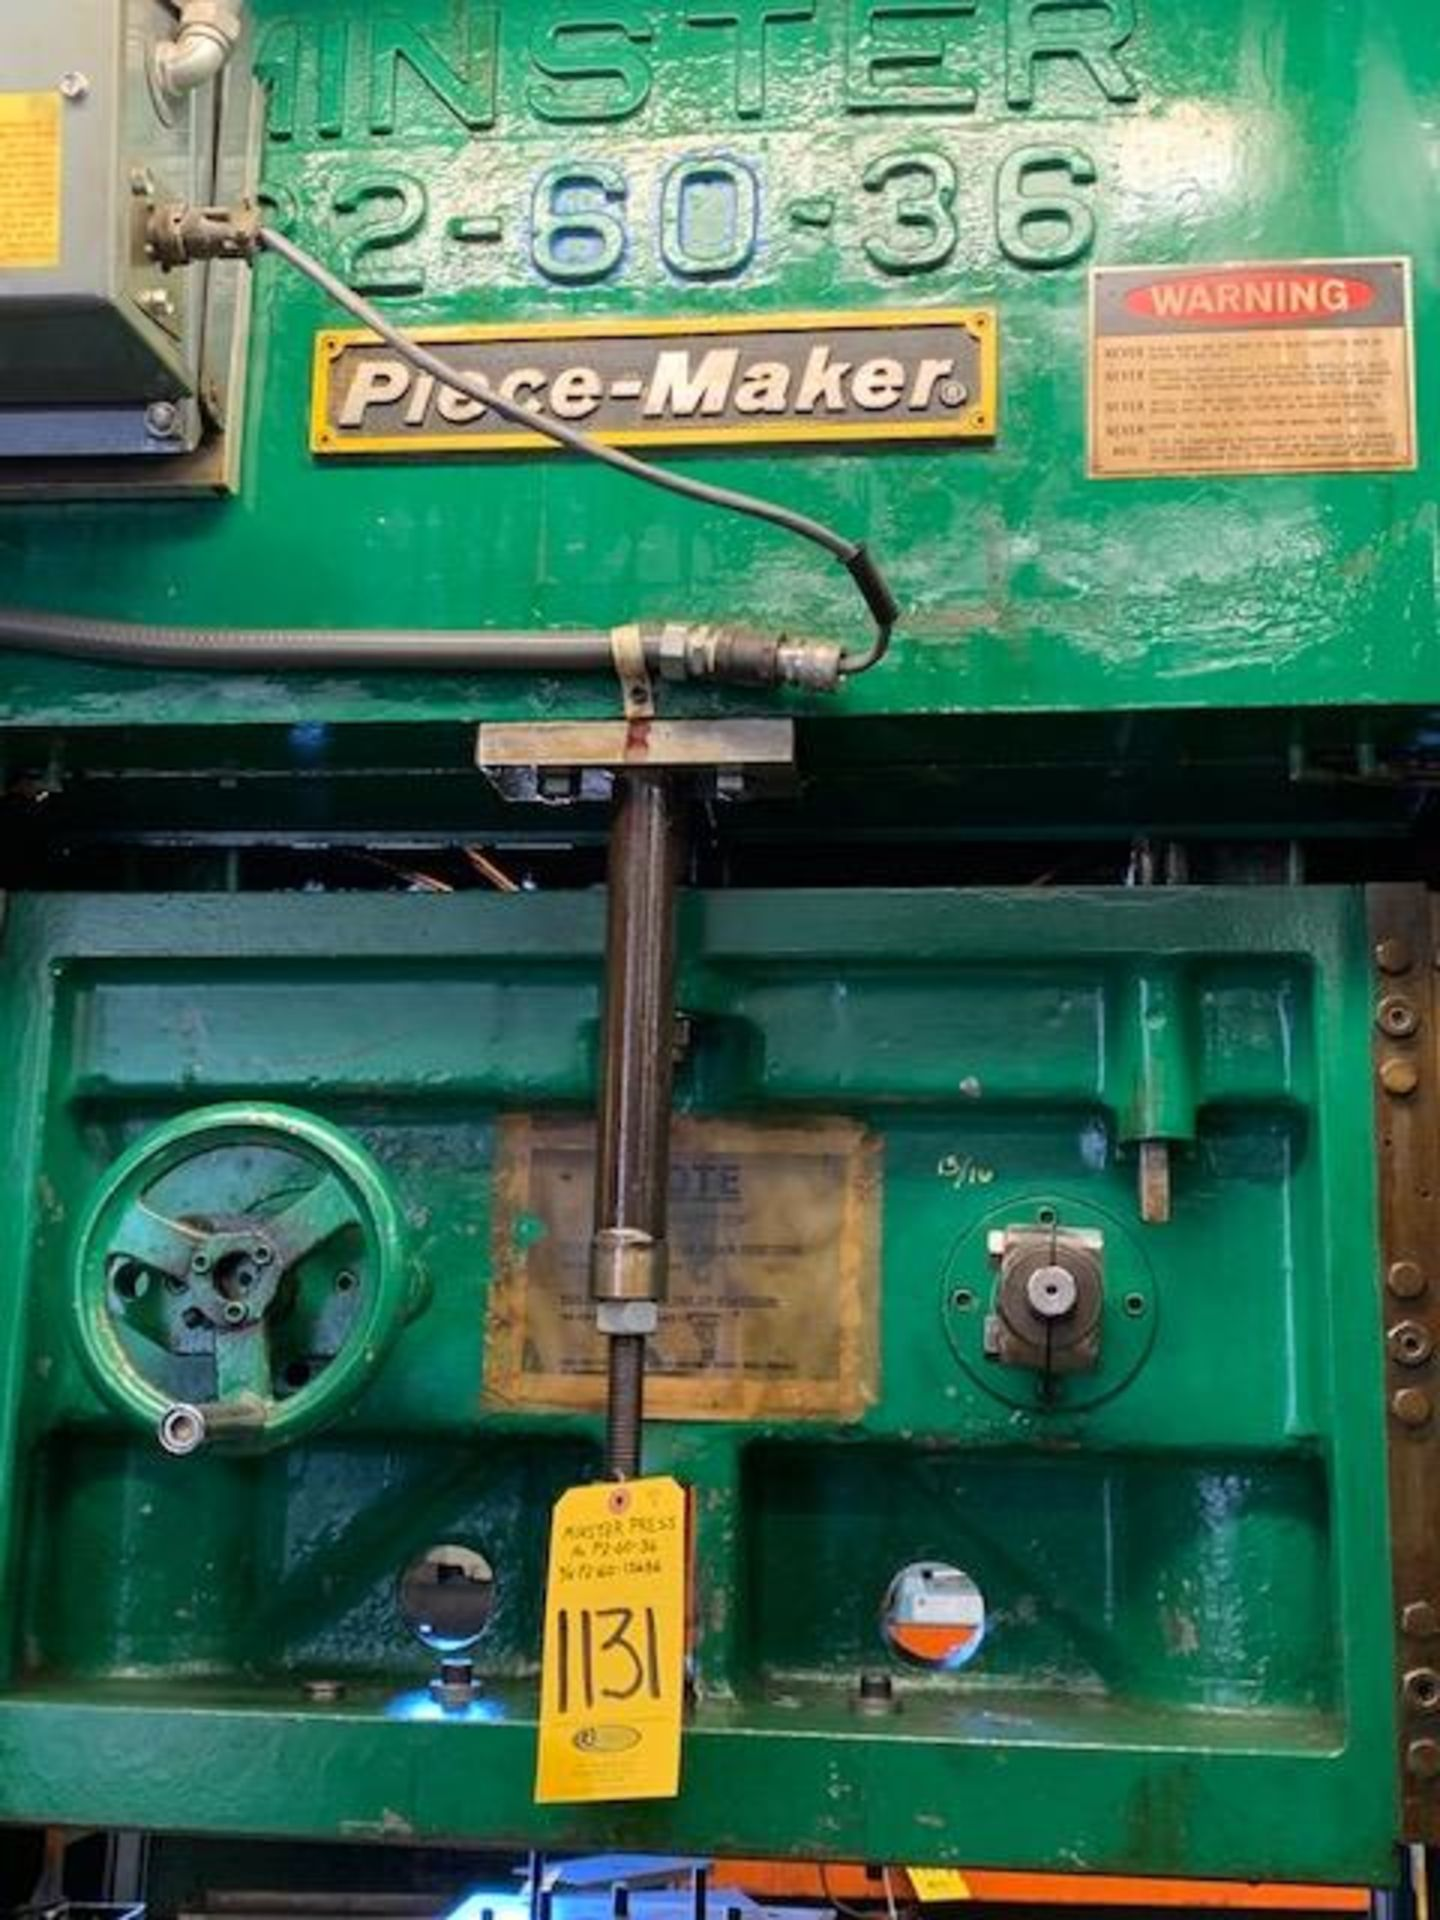 Lot 1131 - 1965 MINSTER P2-60-36 PIECE-MAKER SSDC PRESS, S/N P2-60-15686